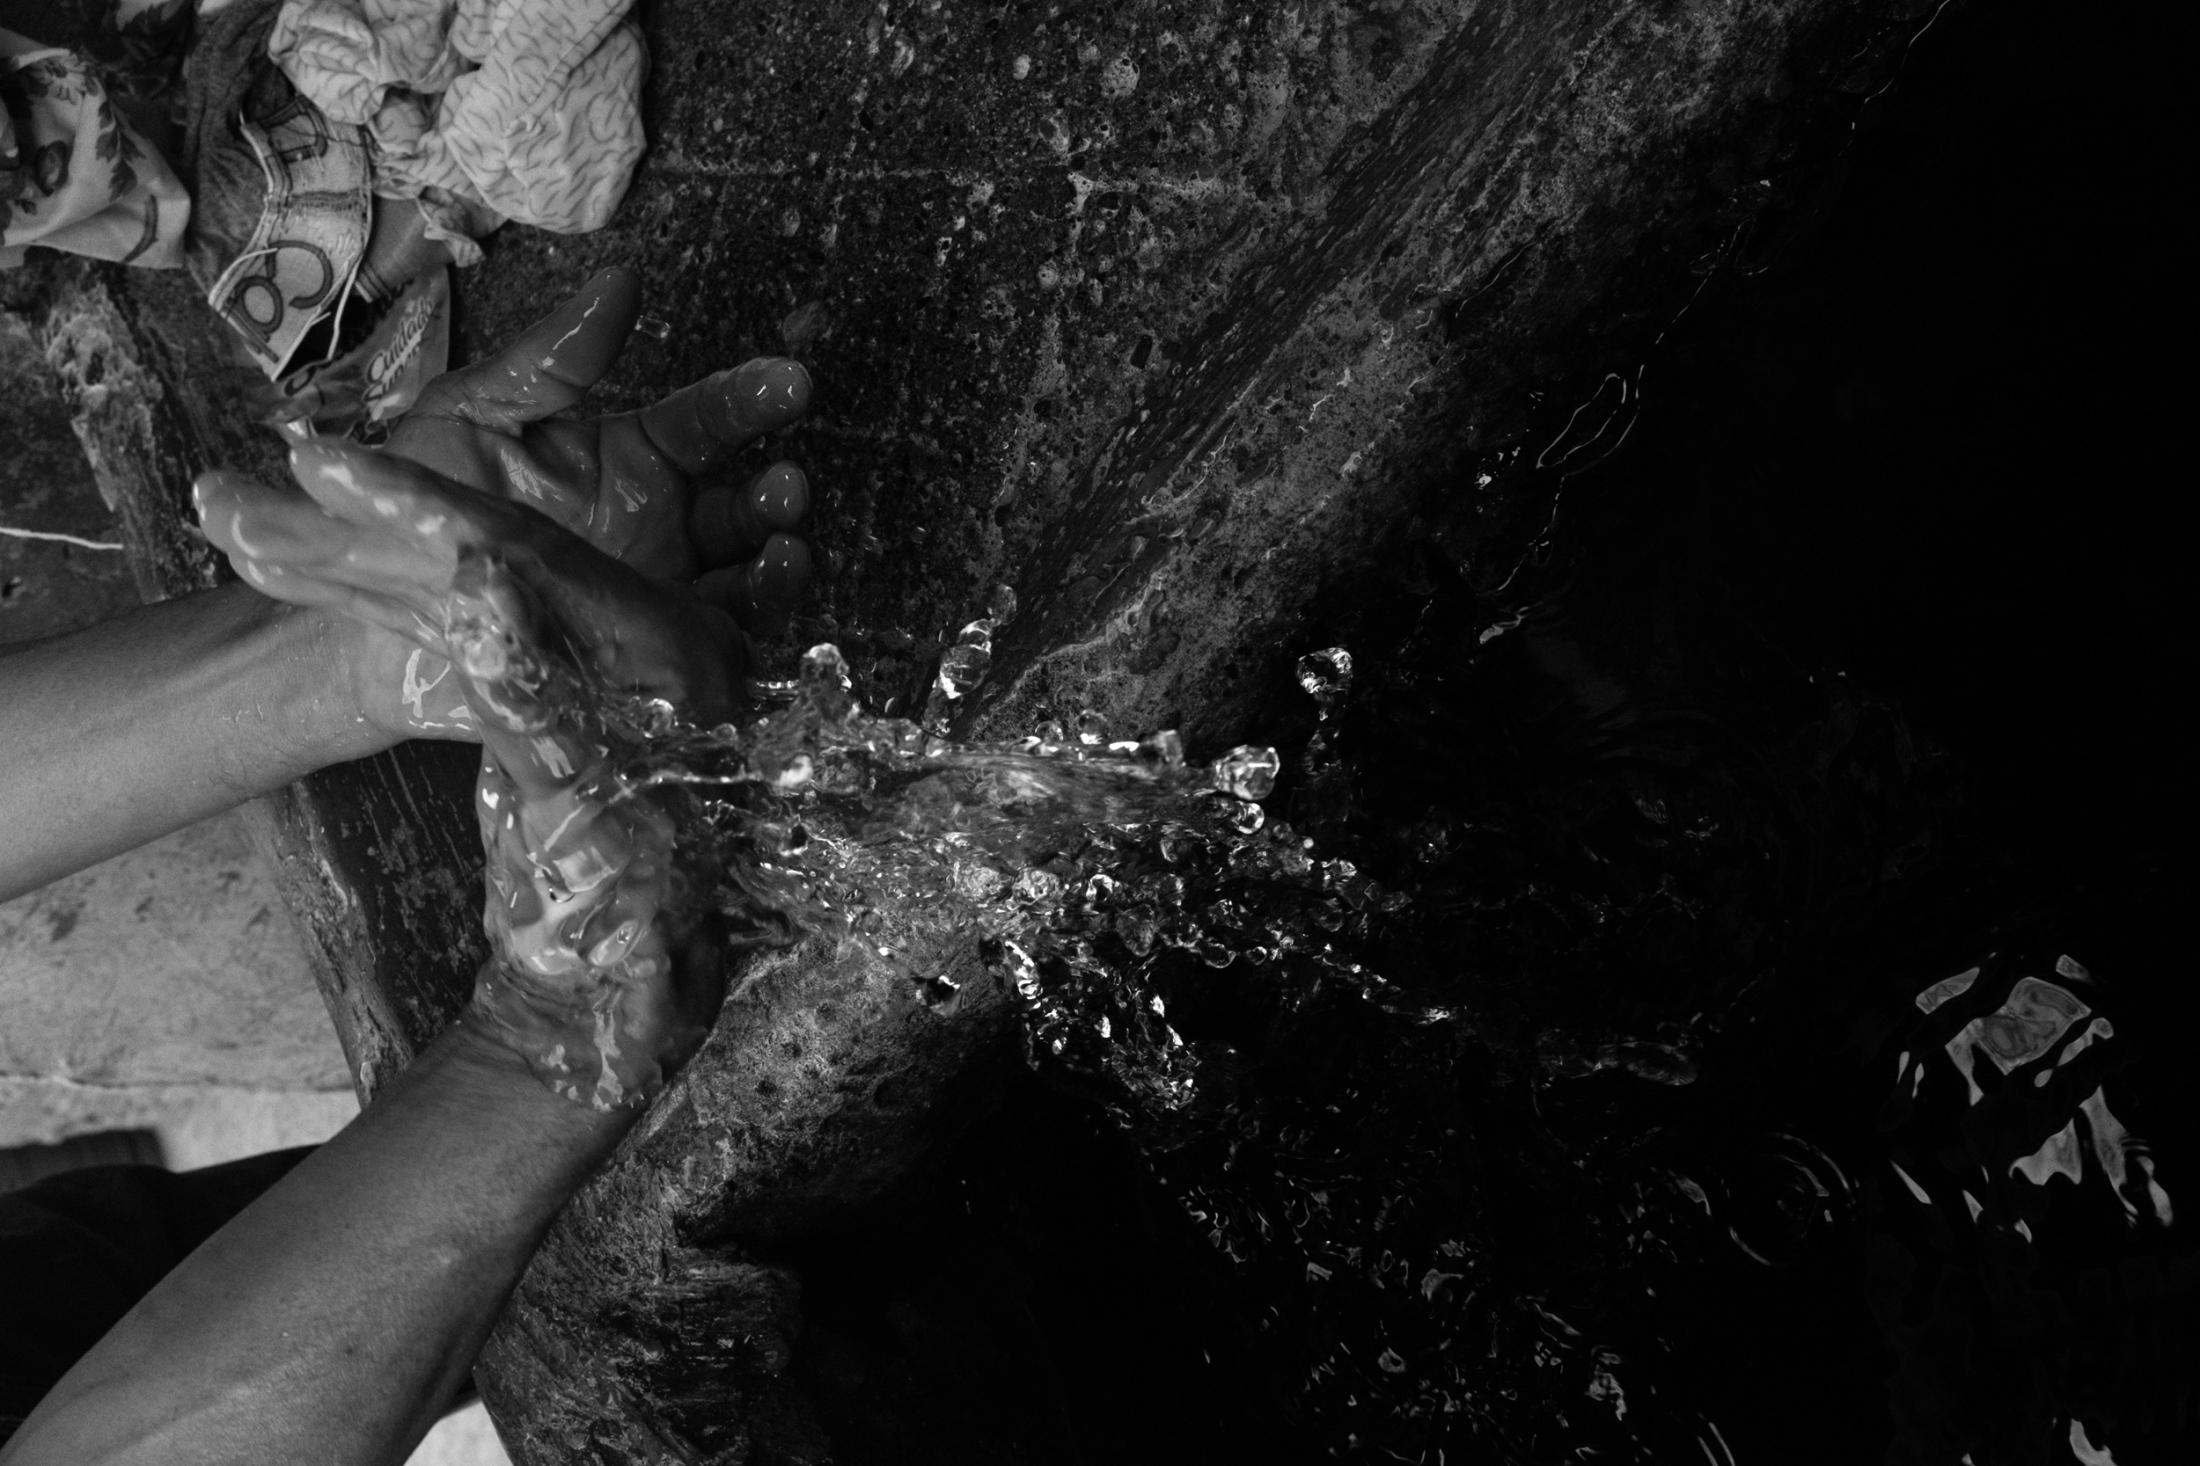 Art and Documentary Photography - Loading ZuletaR__os_CarangasYElJaguar_009.JPG